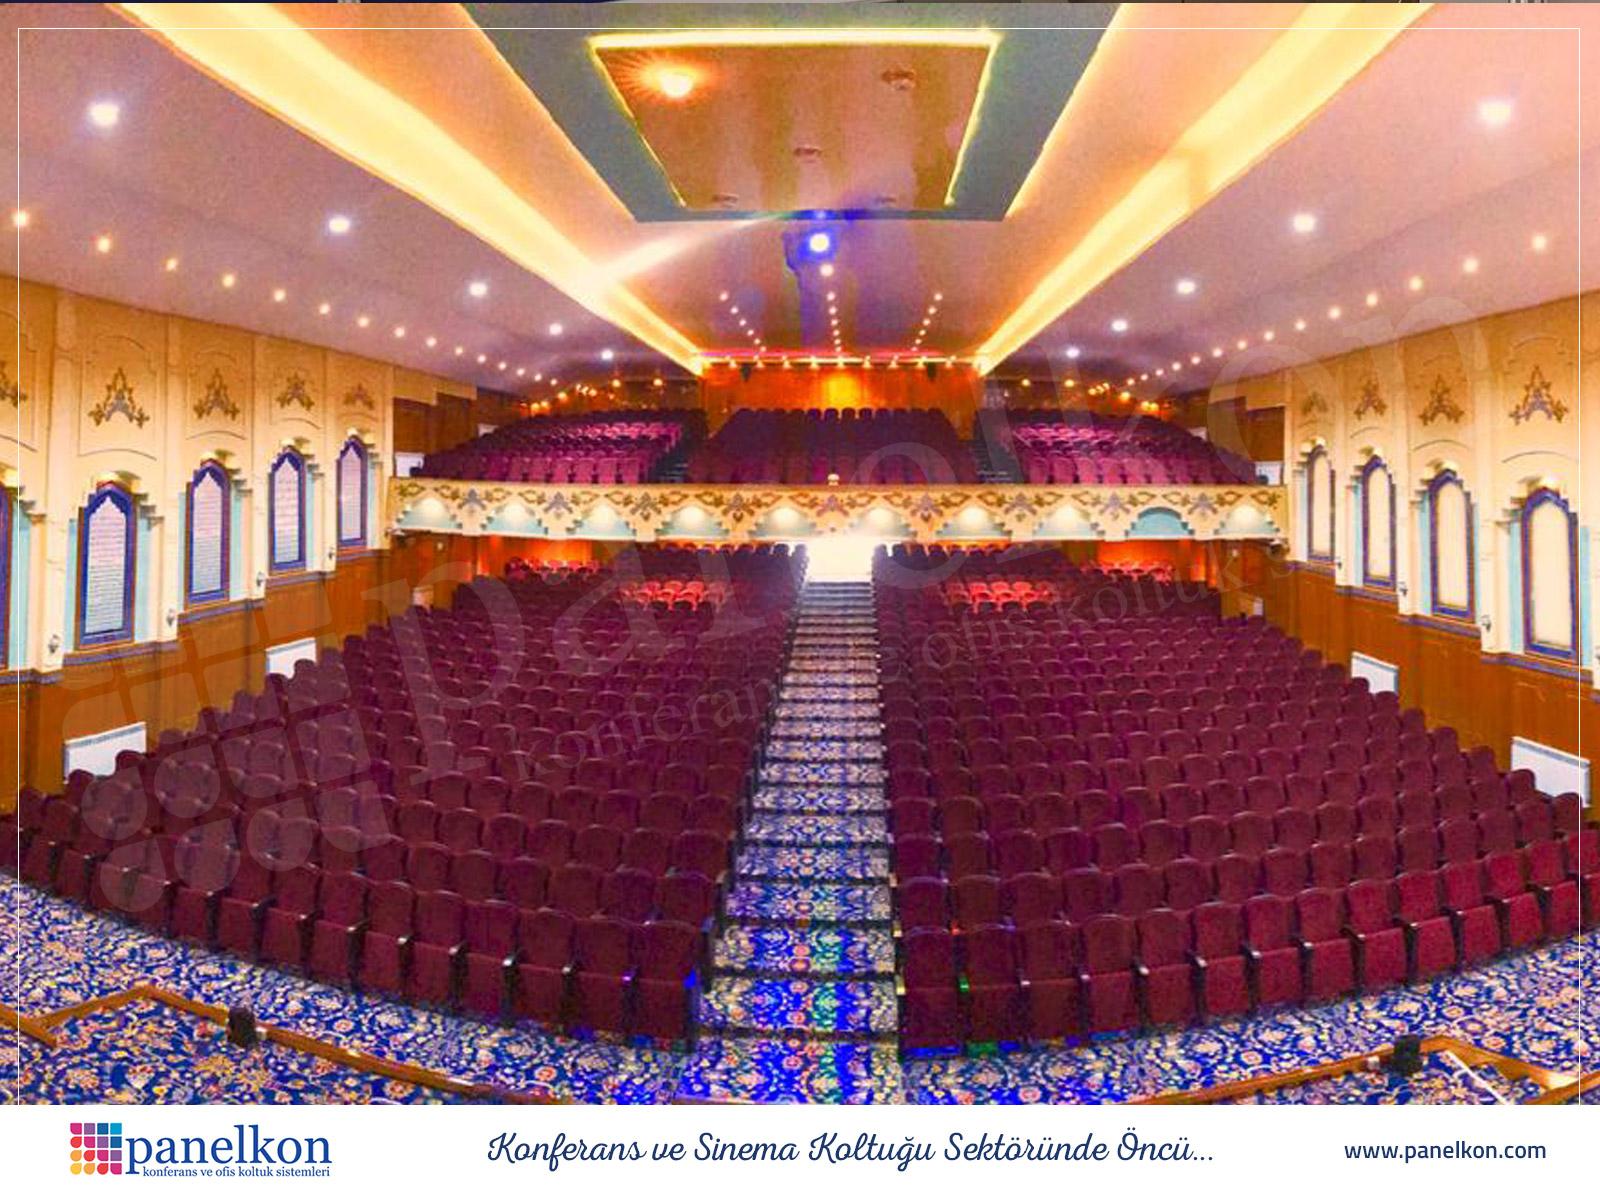 konferans-koltukları